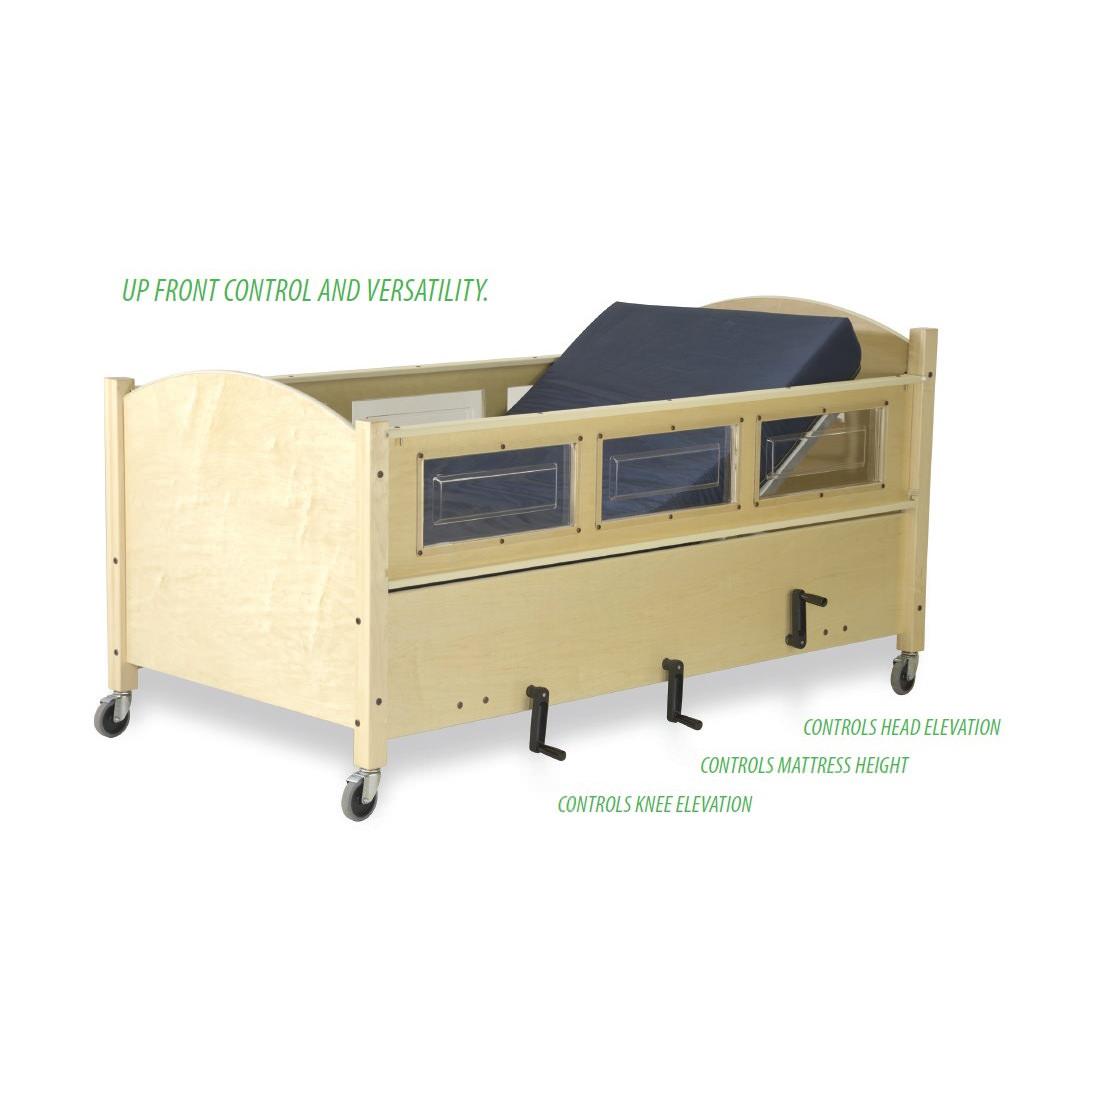 SleepSafe low bed